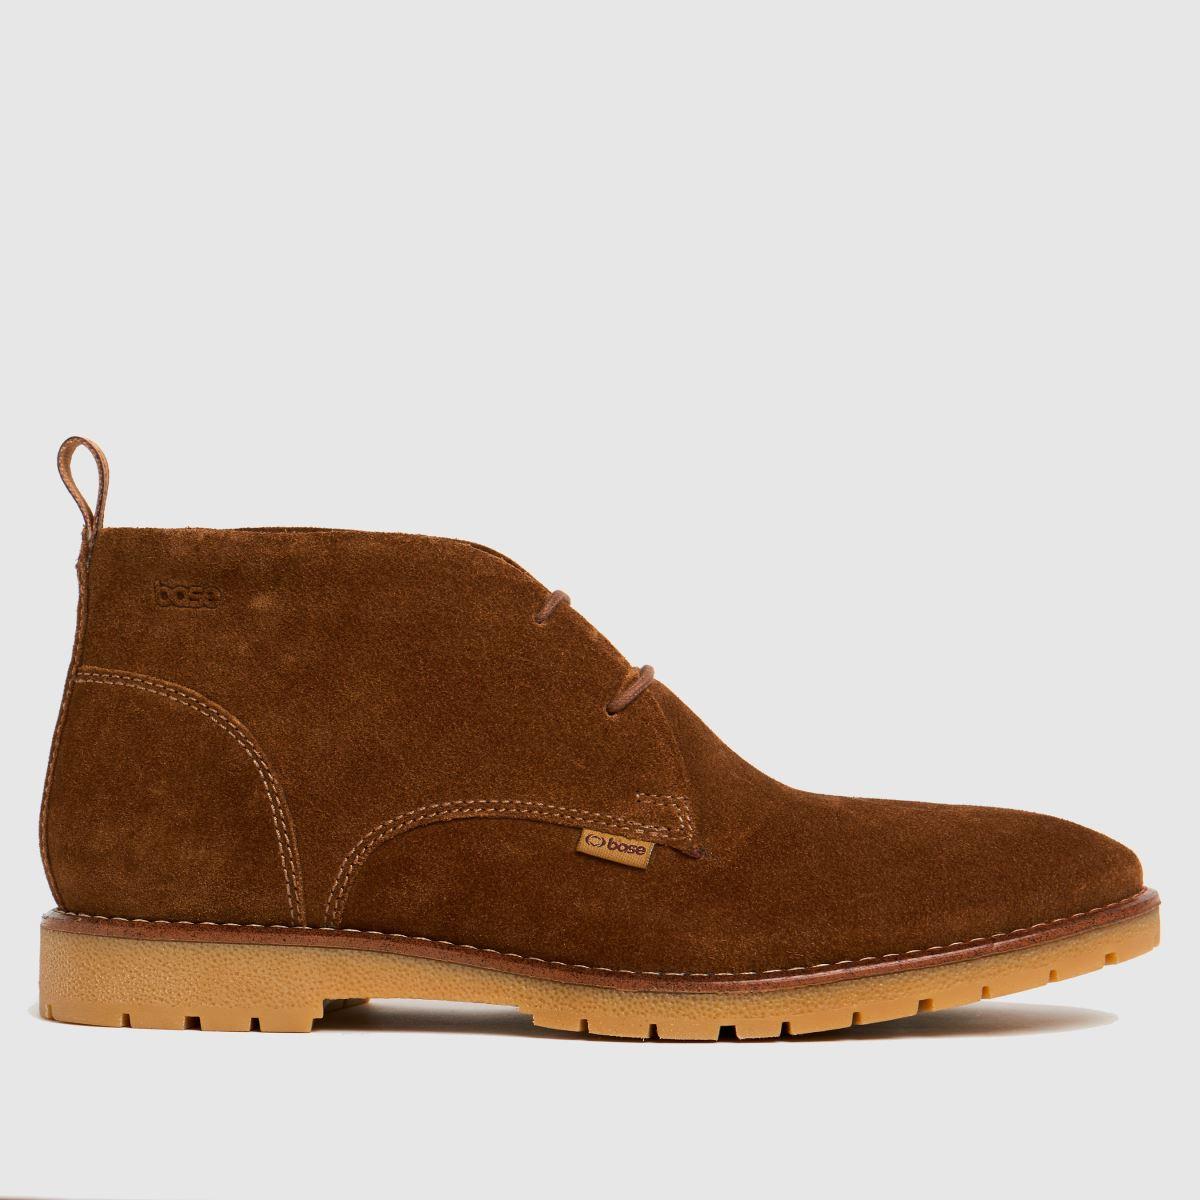 Base London Tan Miller Boots